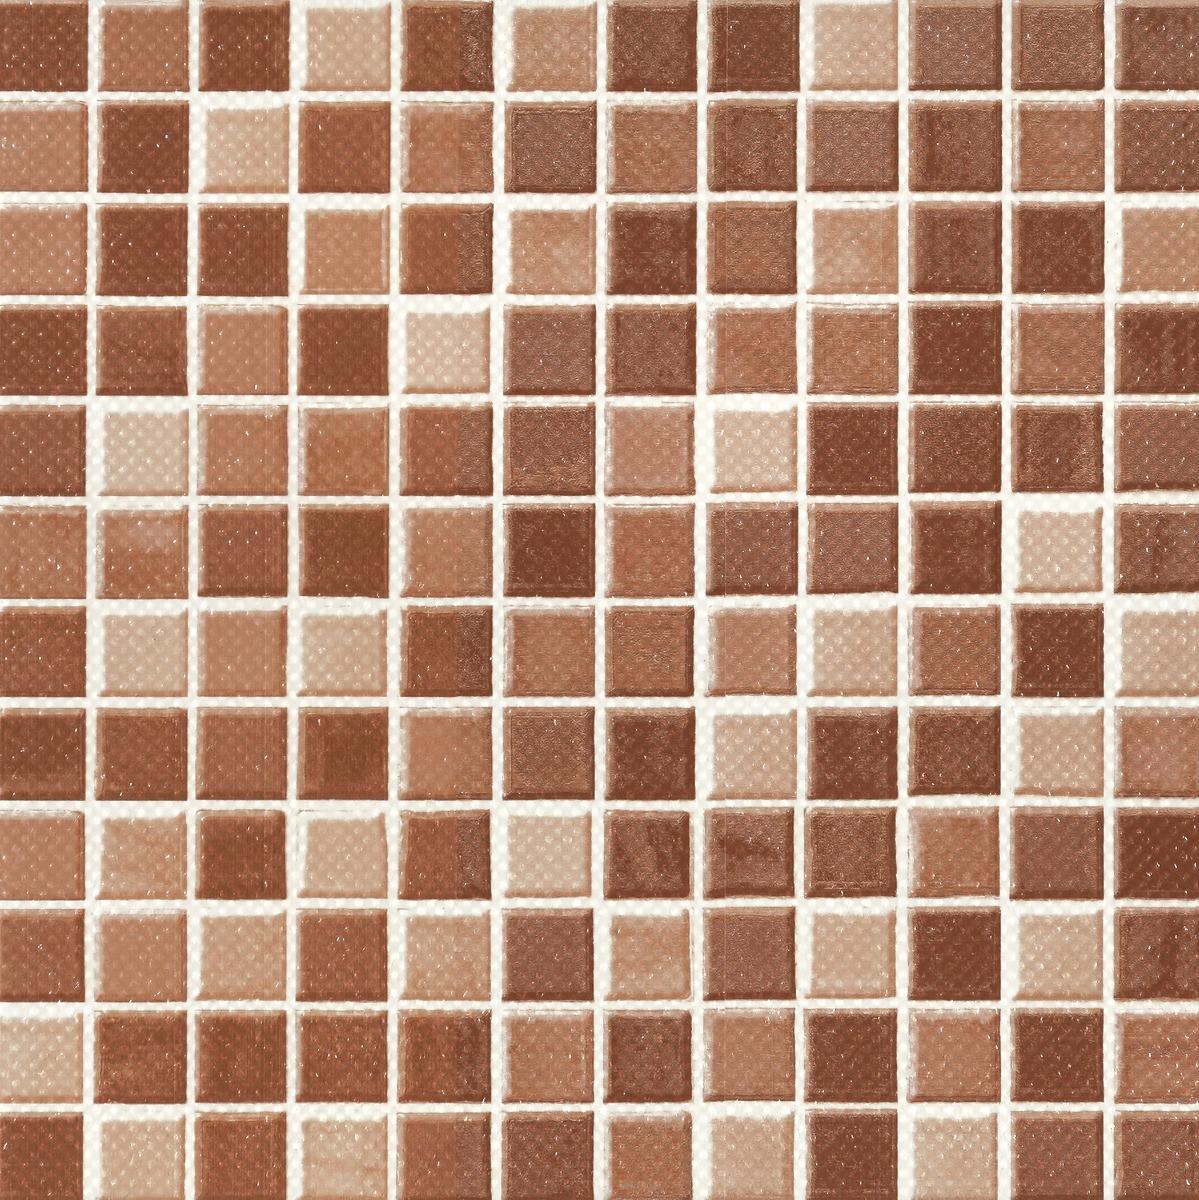 BFM EC Mosaic Brown